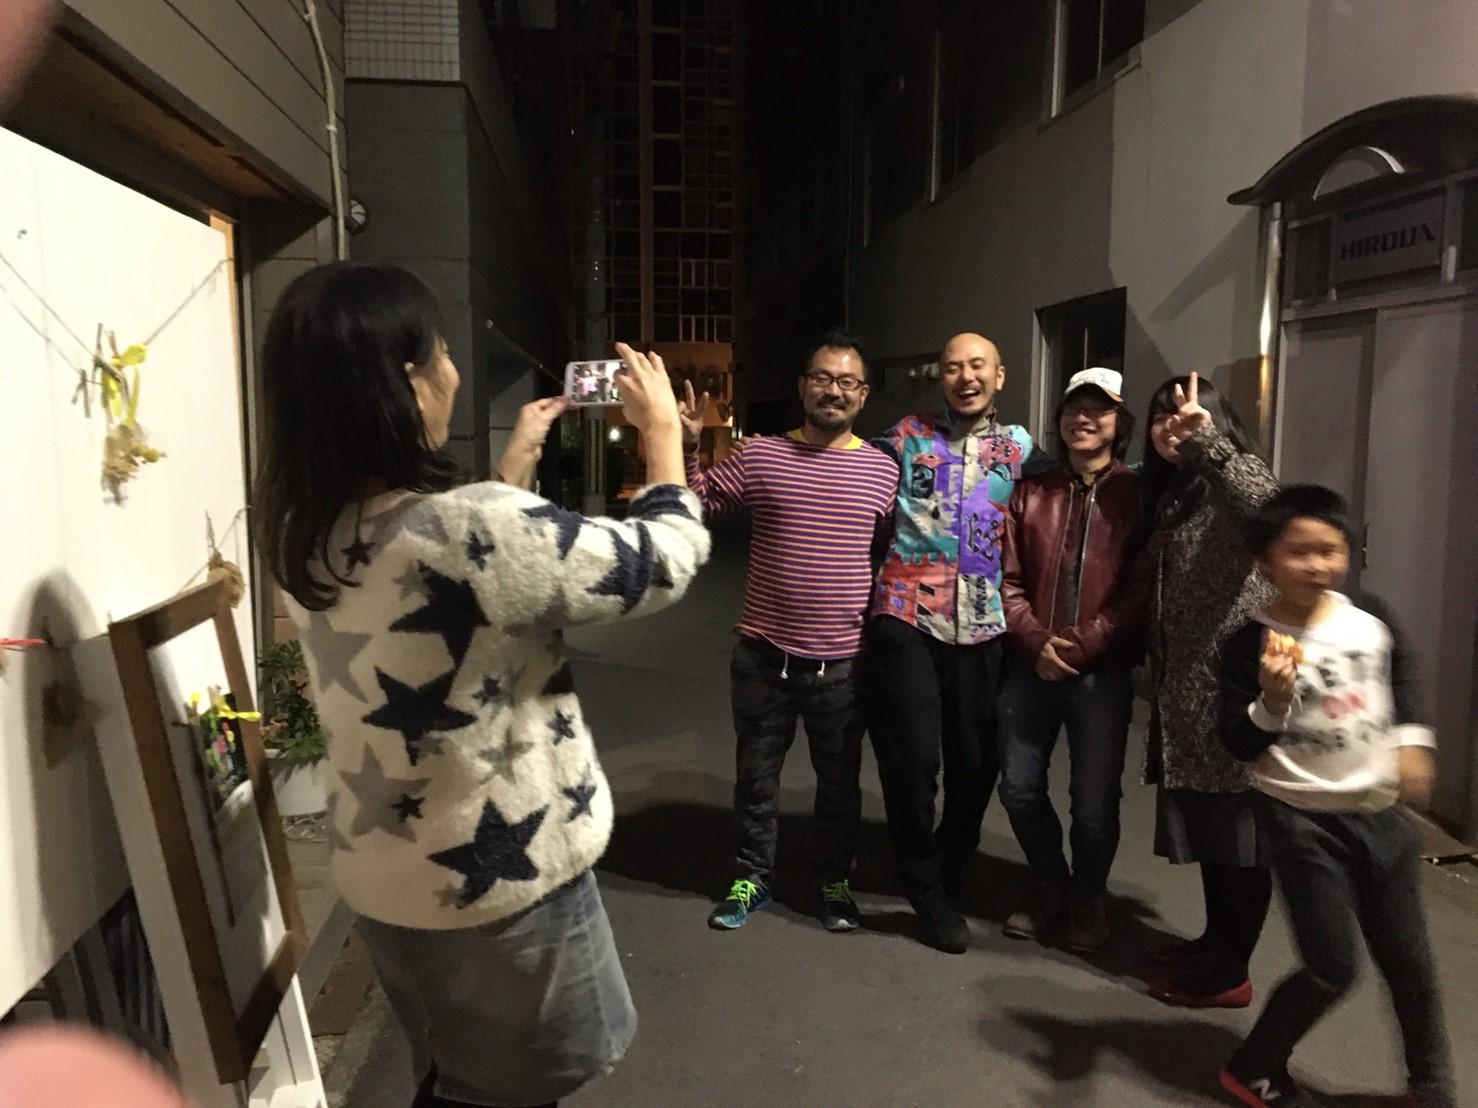 ROOTS FACTORY阪井さん、橋本せーし、おりえちゃんとロックオン